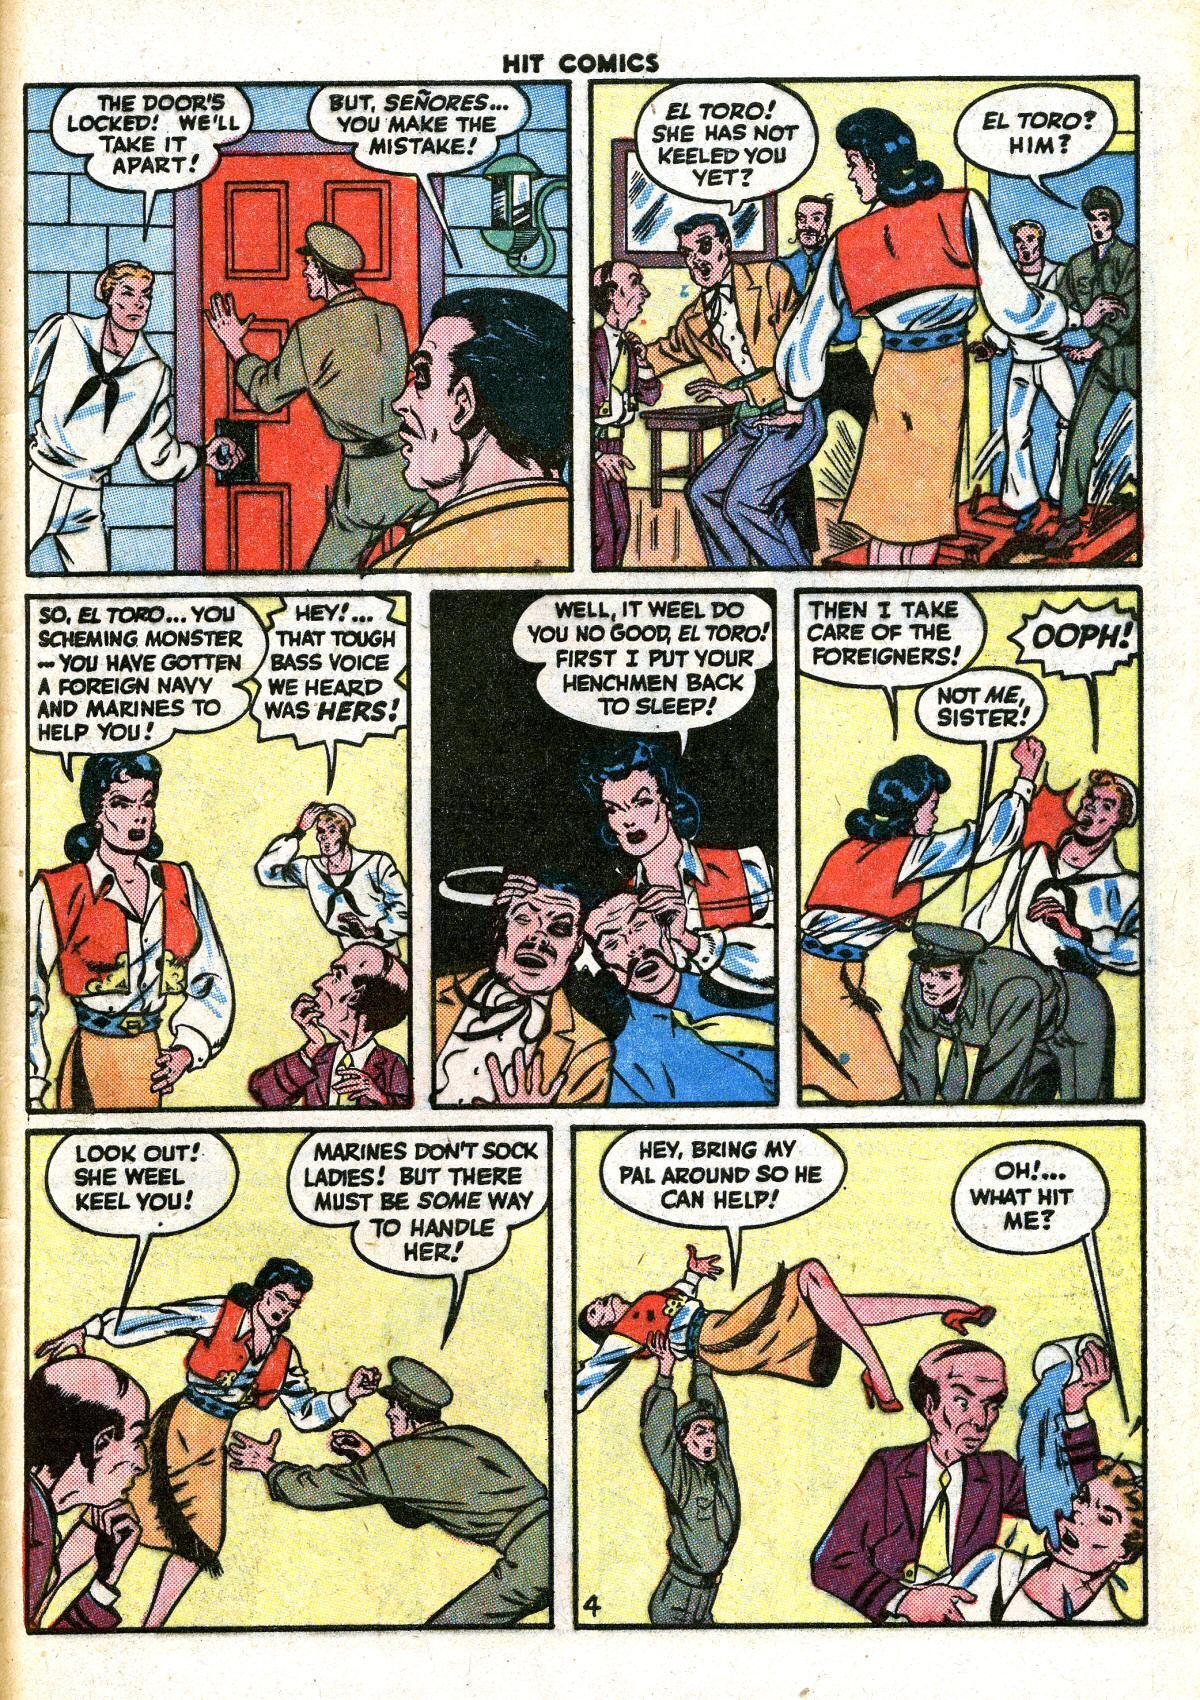 Read online Hit Comics comic -  Issue #41 - 49